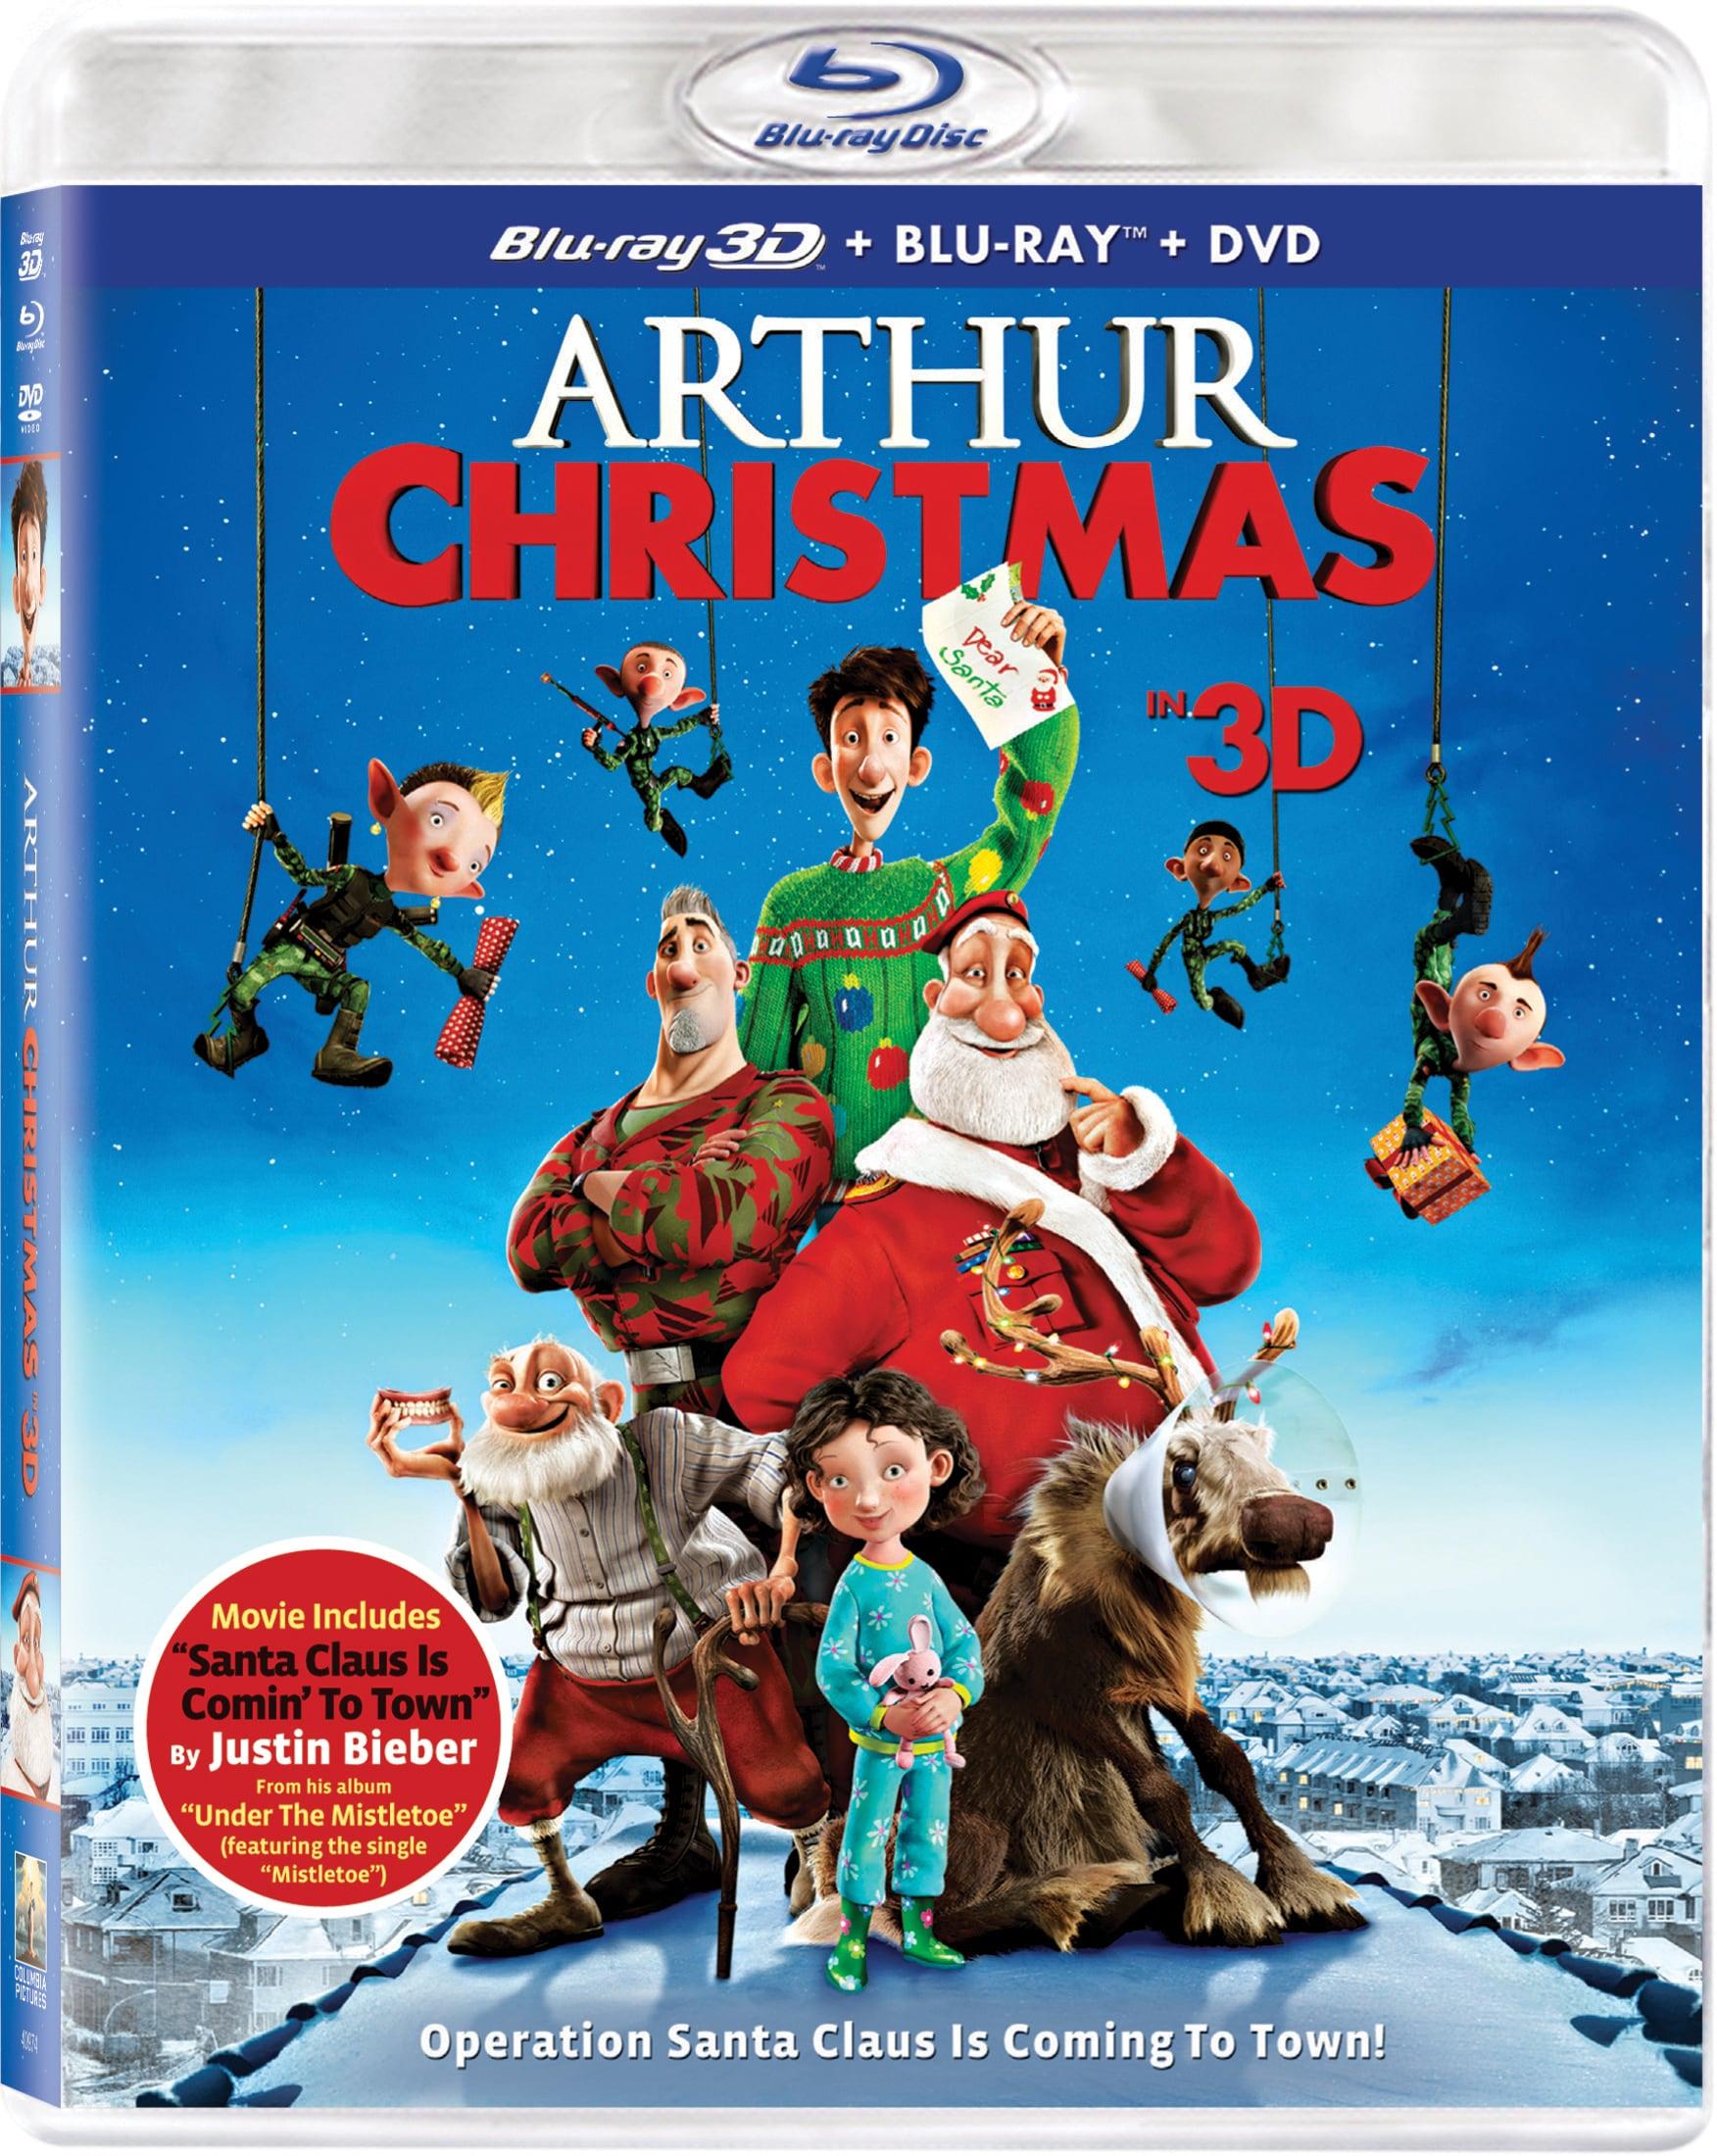 Arthur Christmas (3D) (Blu-ray/DVD)